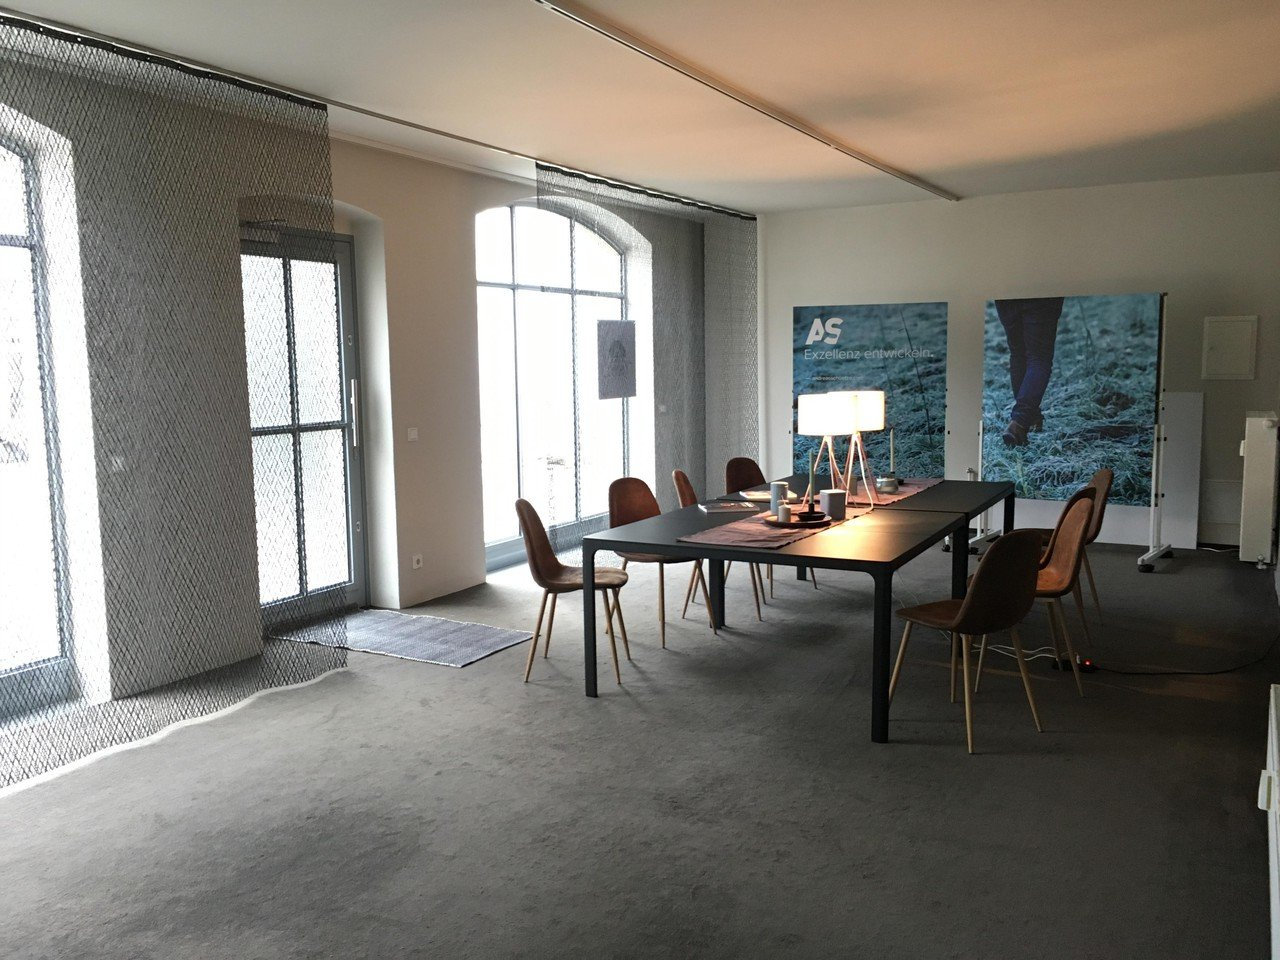 Dresden training rooms Vergaderruimte Elegant and functional room image 1